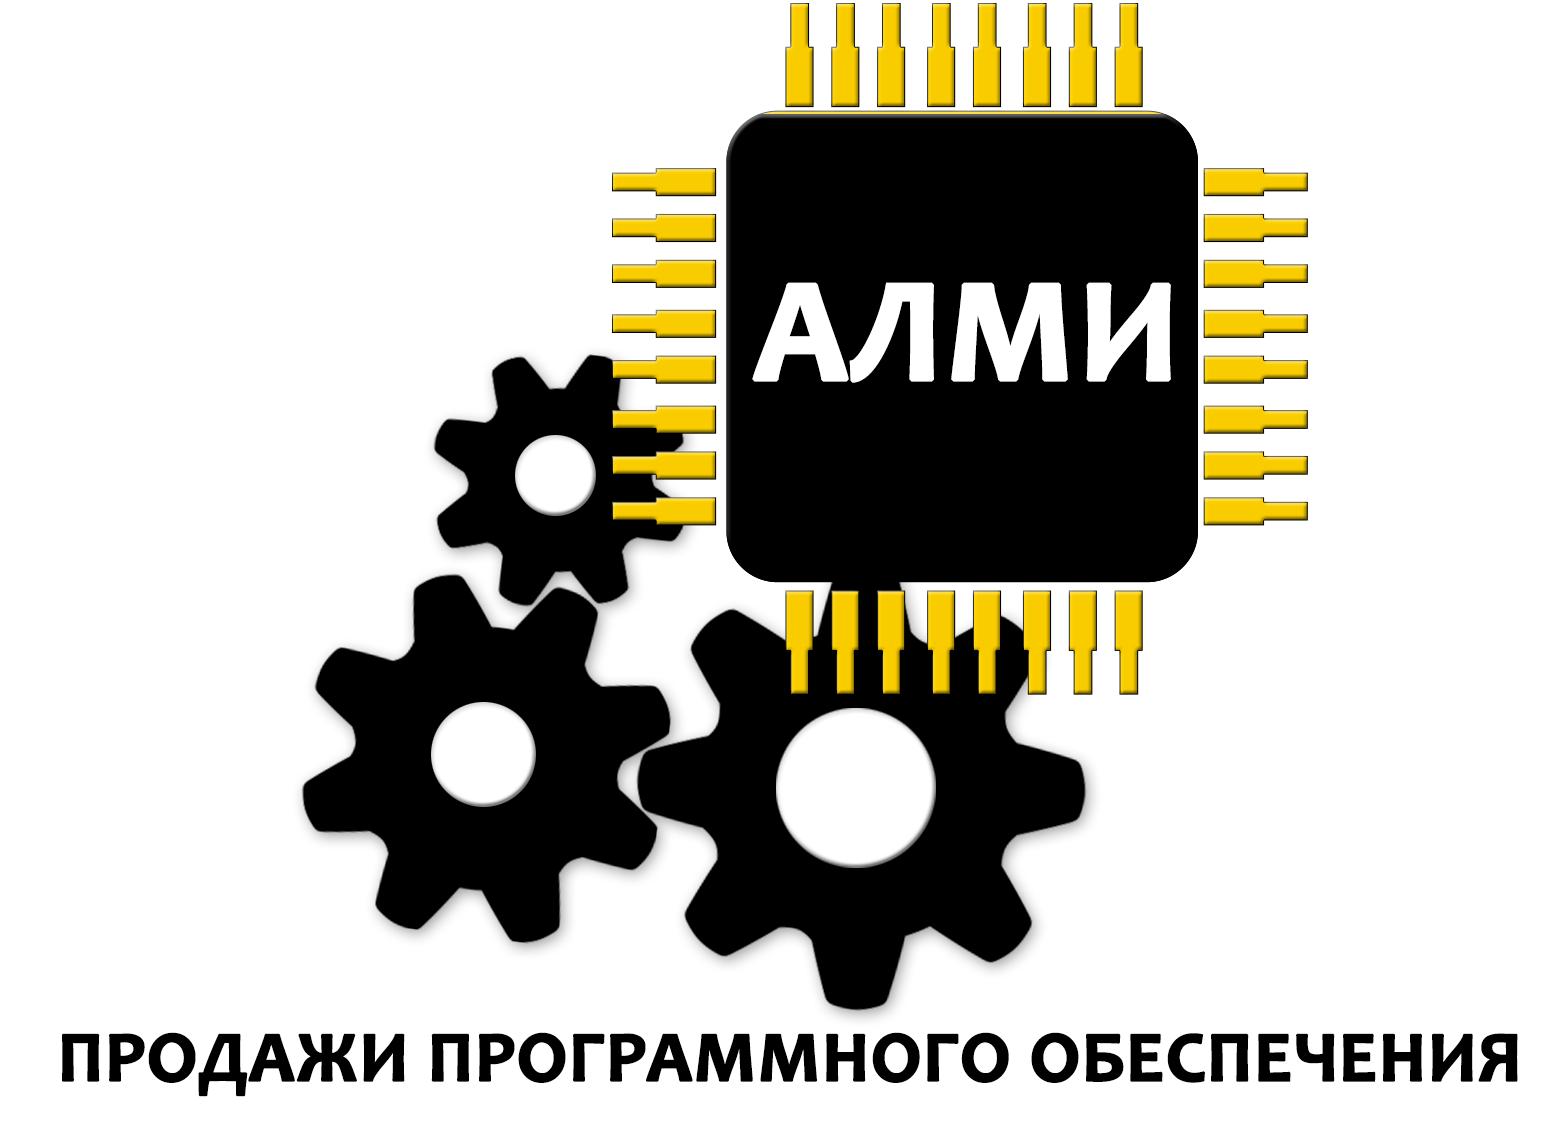 Разработка логотипа и фона фото f_4095989e835d7e11.png